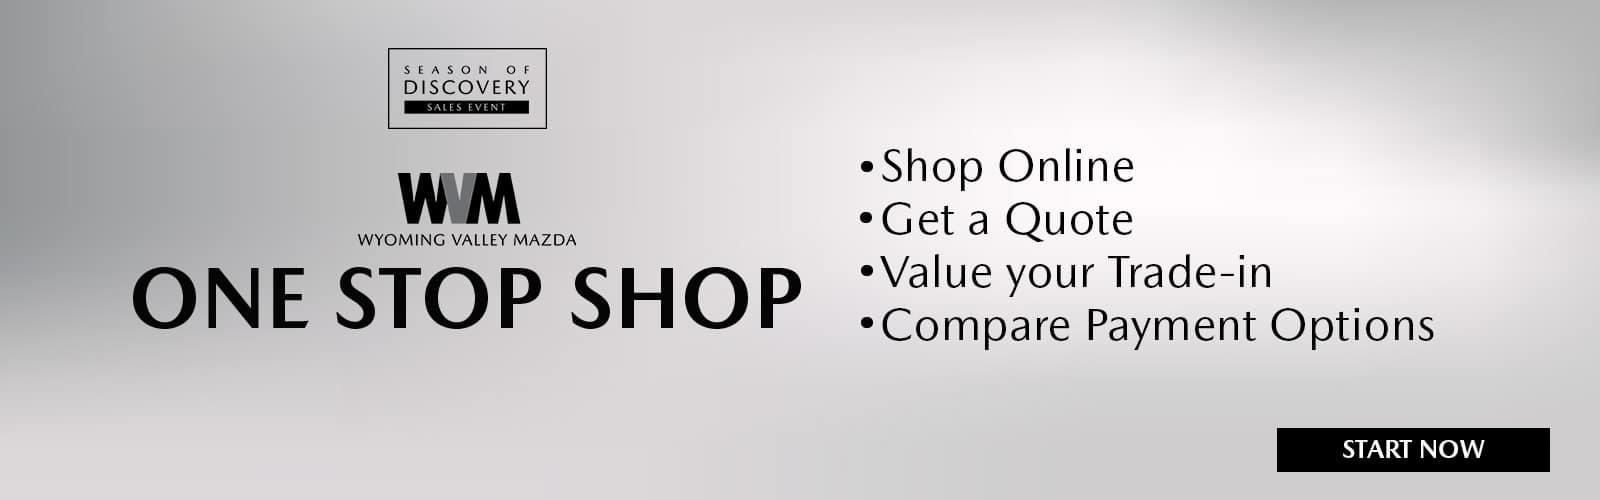 6_21_WV_Mazda_1600x500_one_stop_shop1